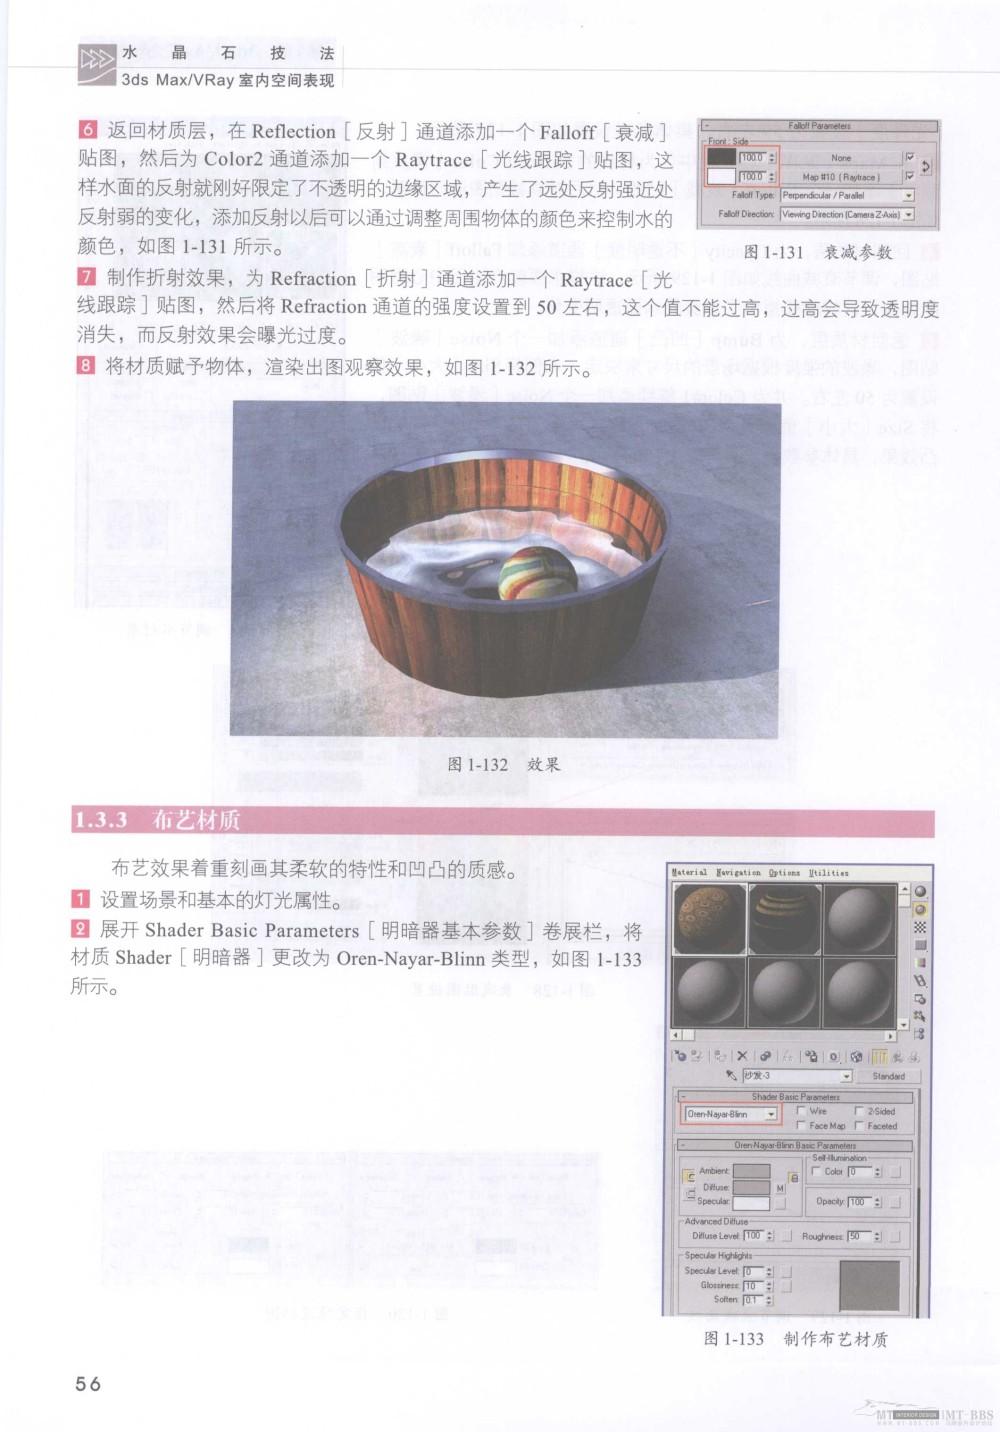 水晶石技法-3ds_Max&VRay室内空间表现_水晶石技法-3ds_Max&VRay室内空间表现_页面_062.jpg